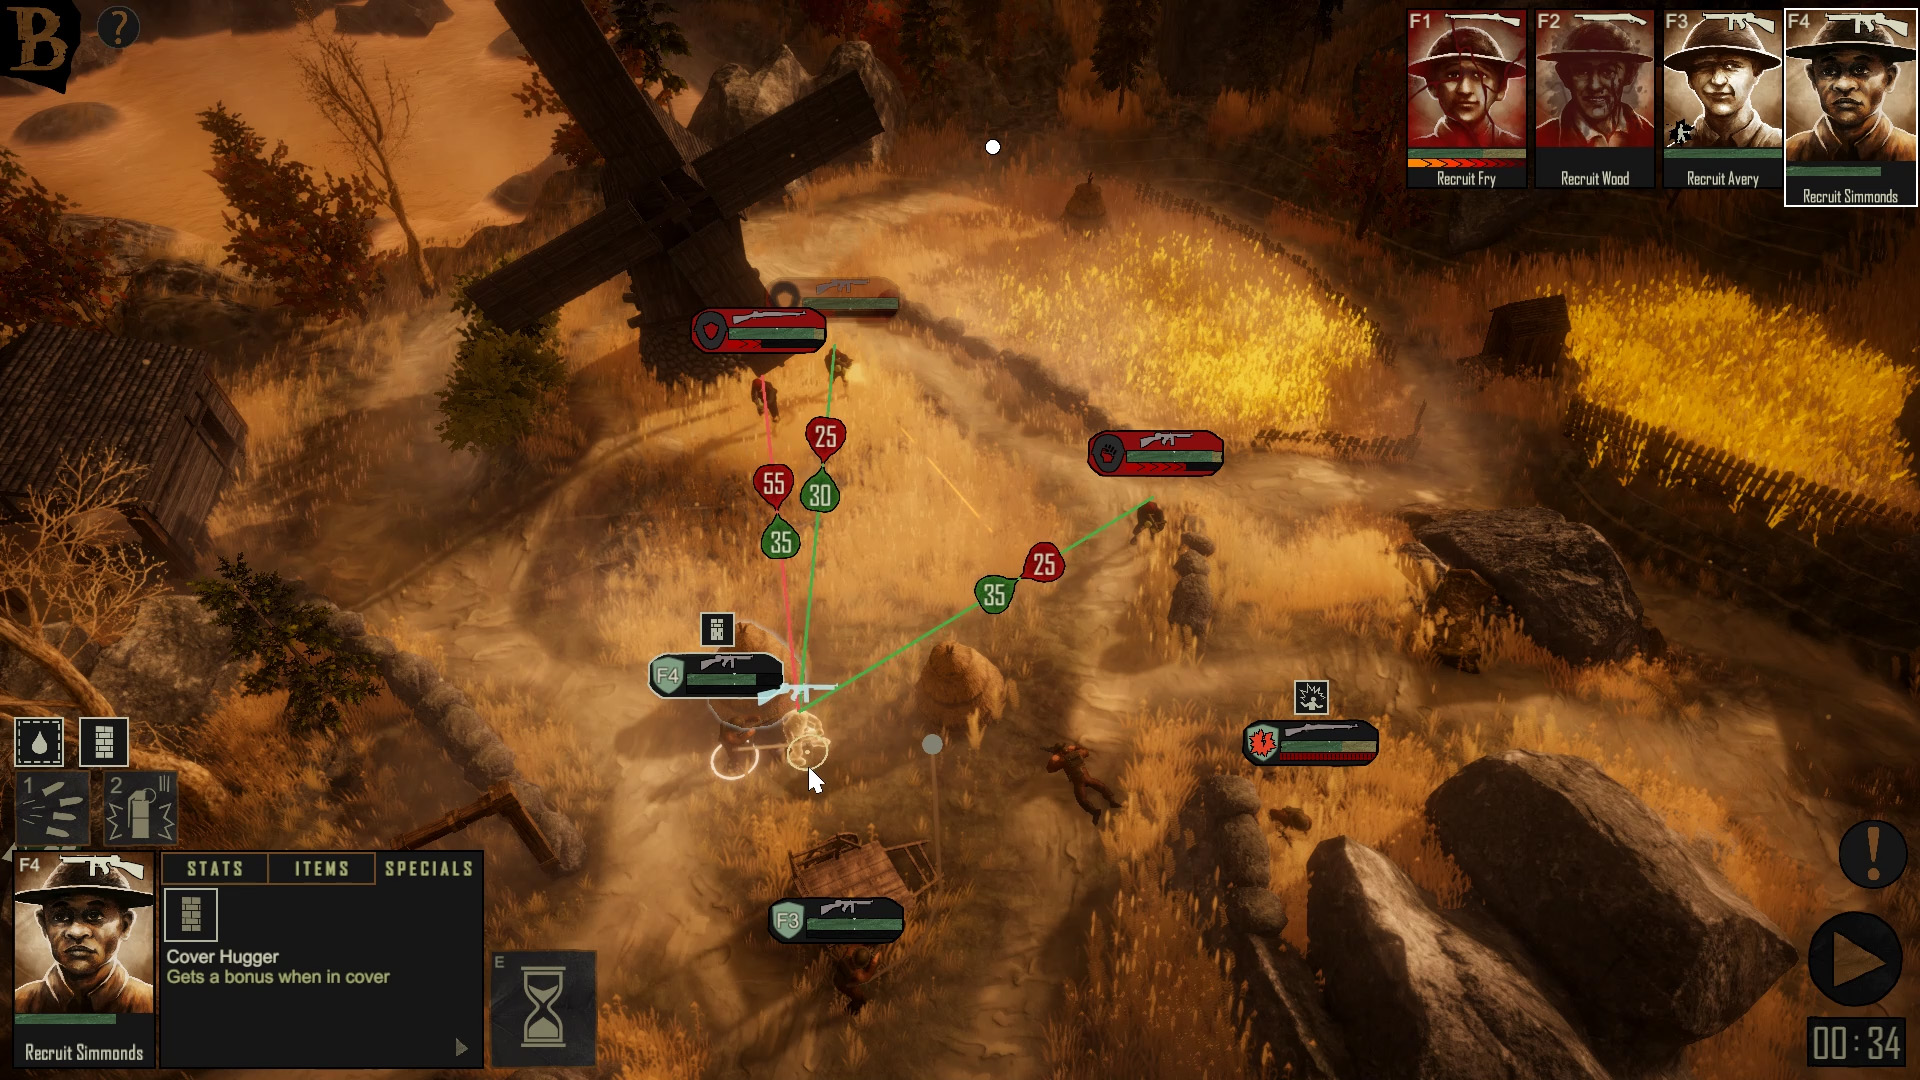 6 0 Firefight planning 1 image - Broken Lines - Indie DB